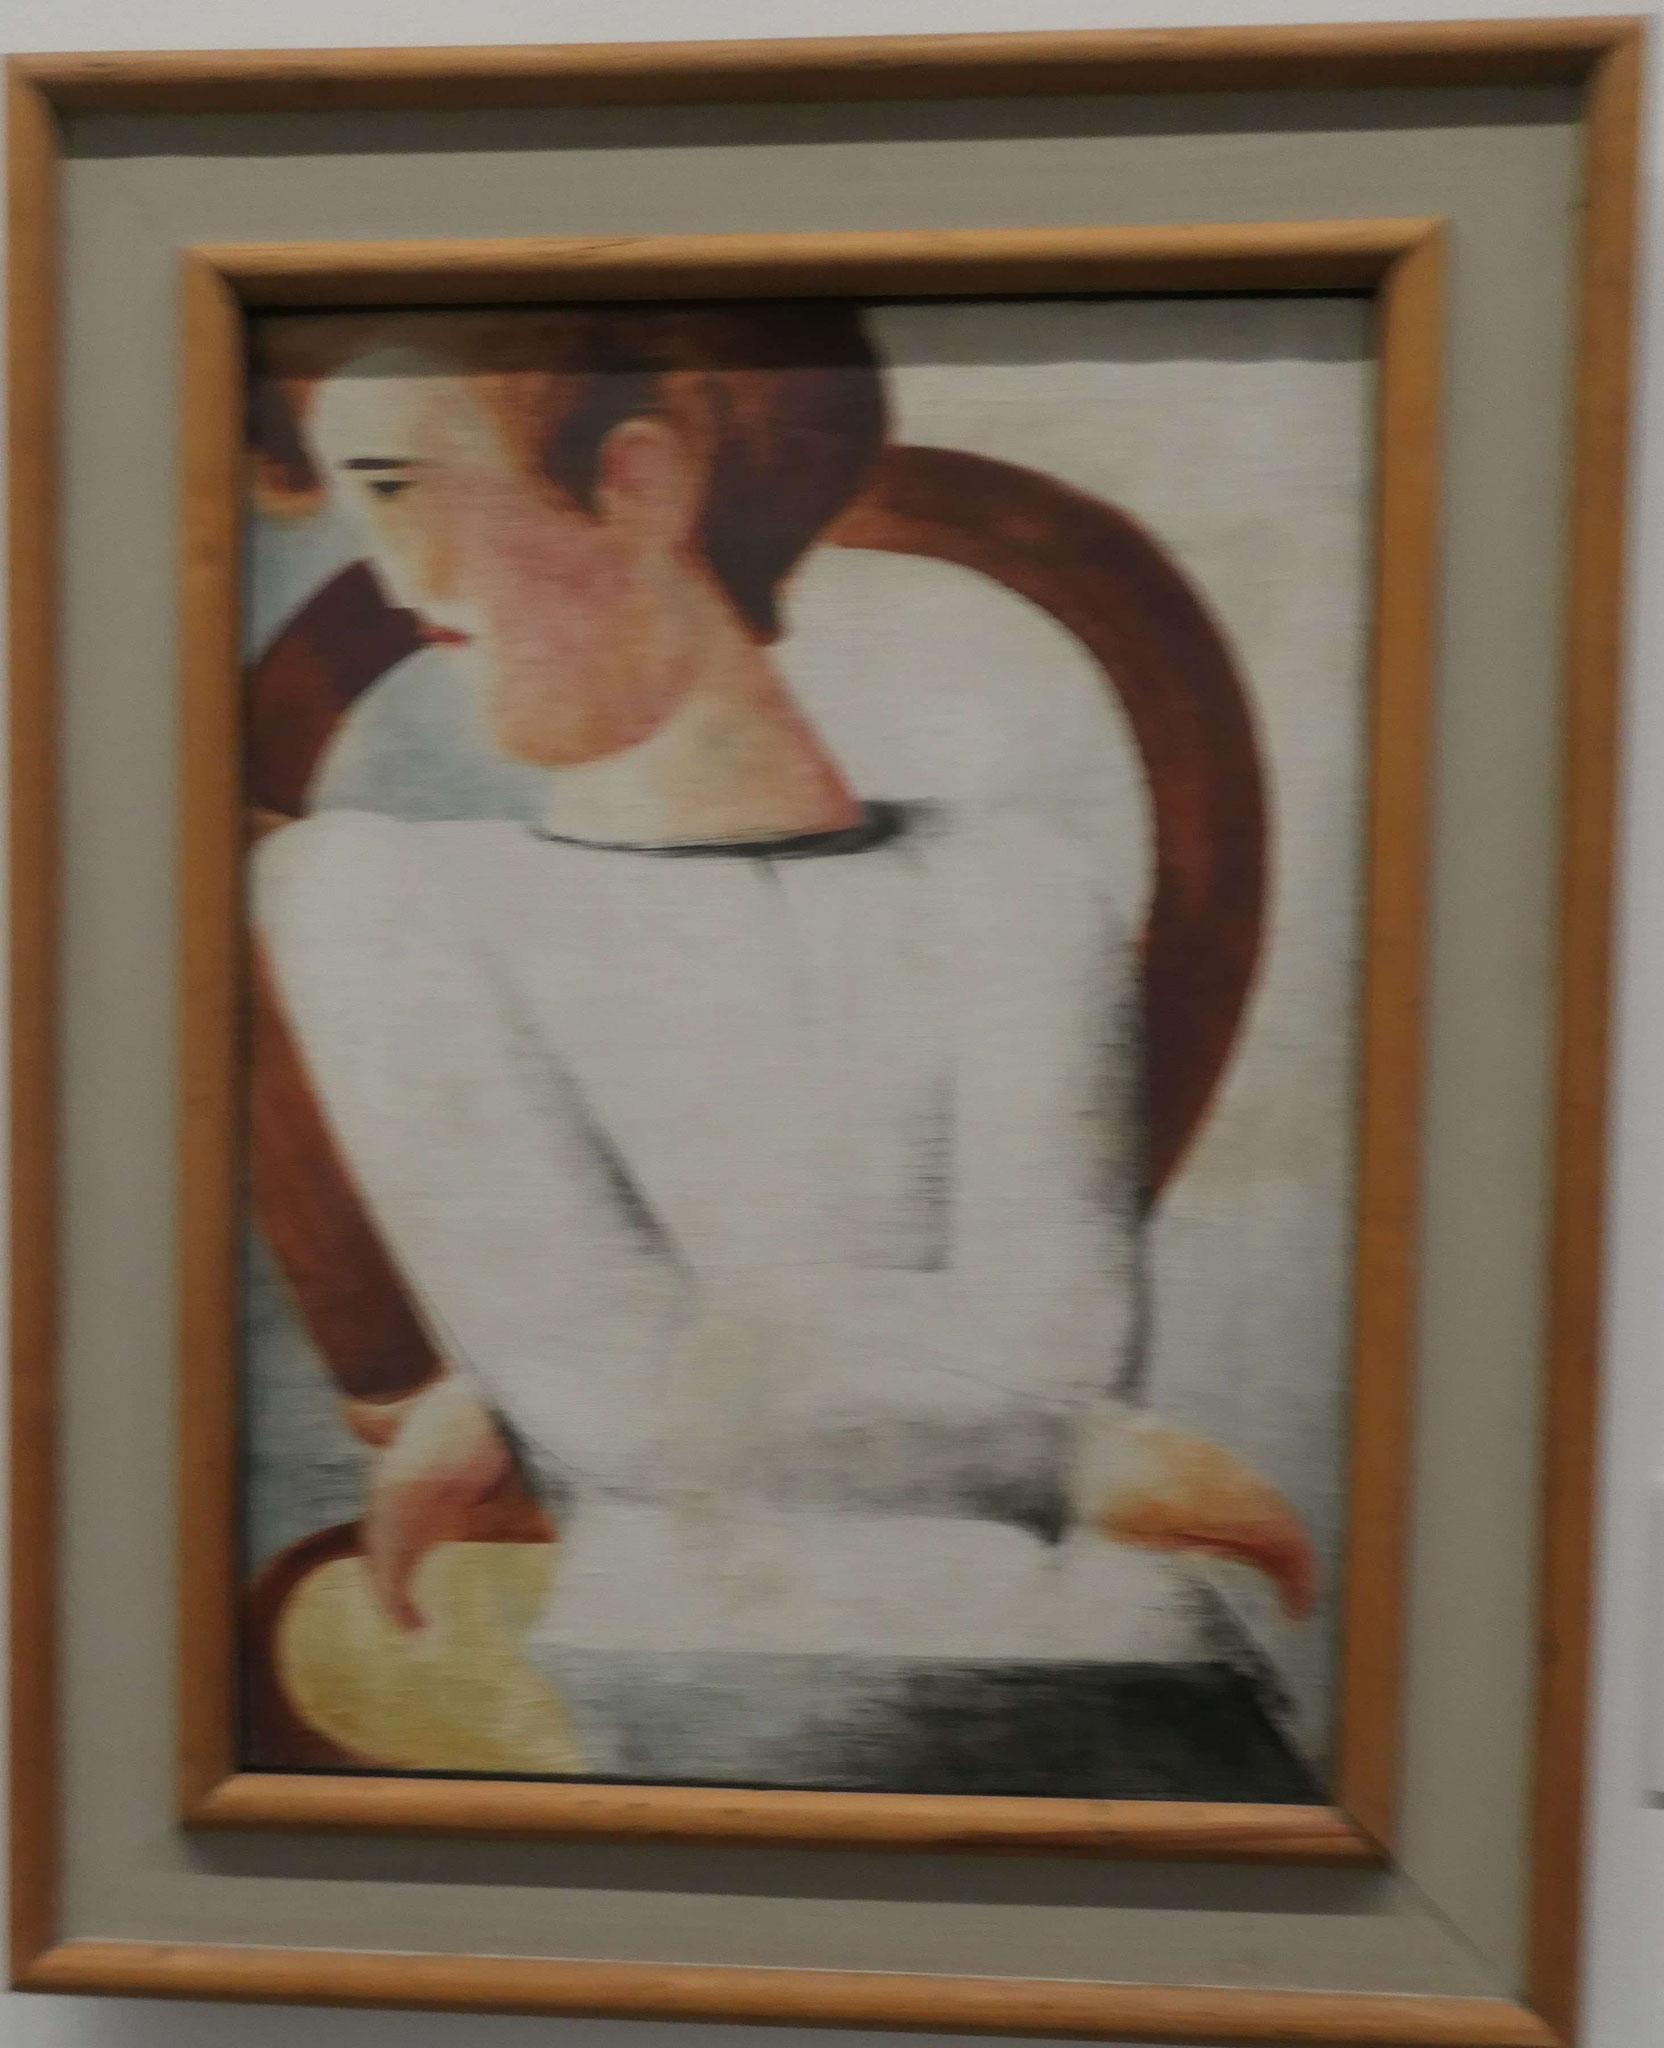 Oskar Schlemmer, Weißer Jüngling, 1930, Neue Nationalgalerie Berlin